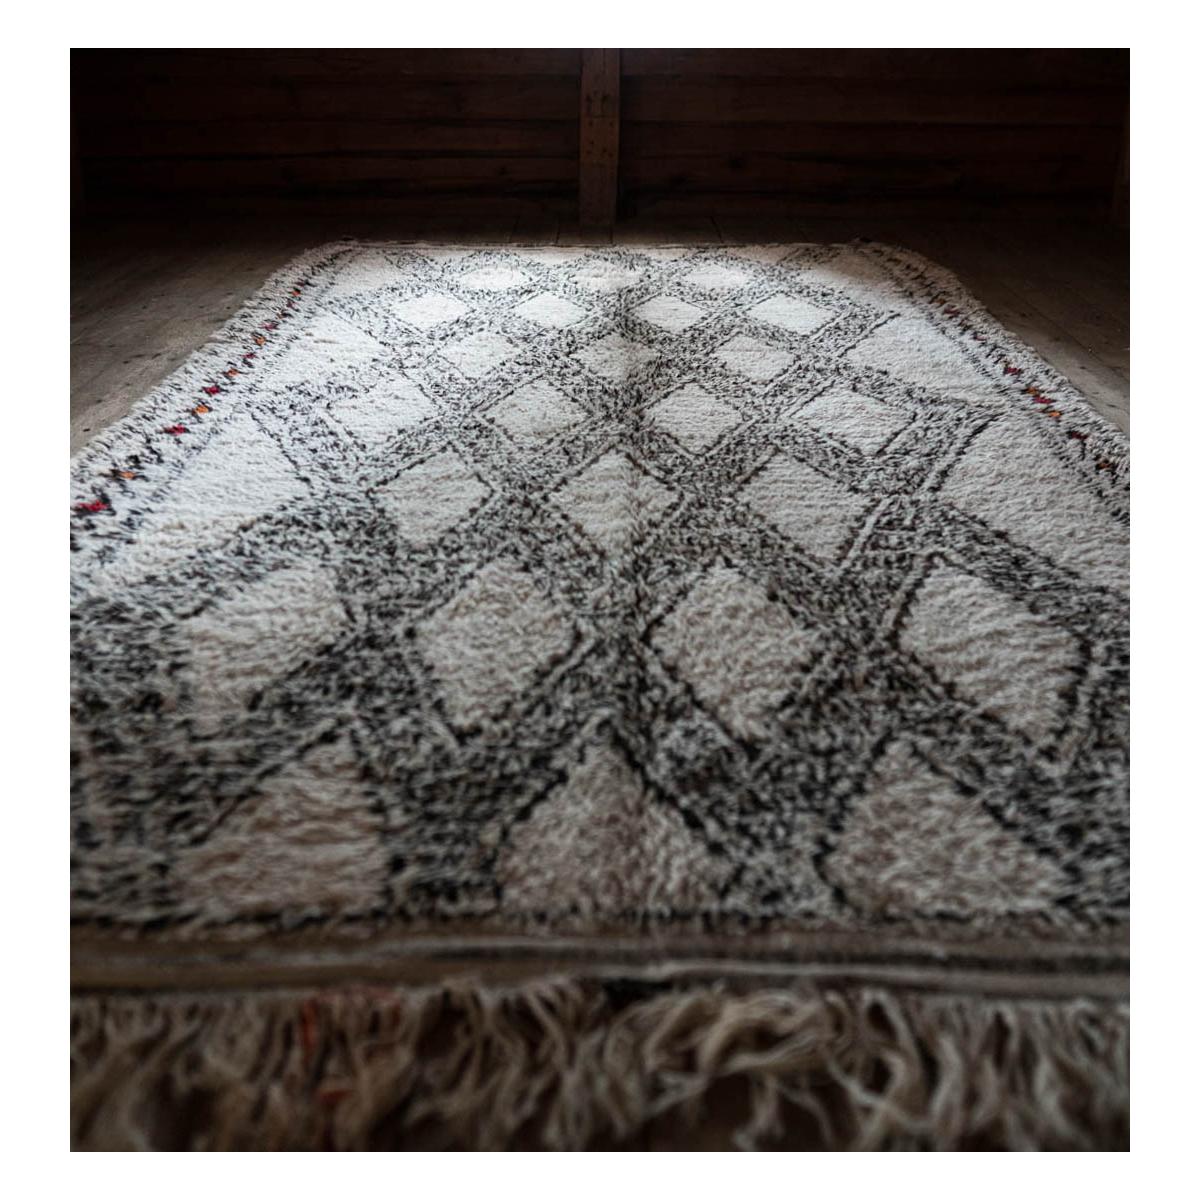 Marmoucha rug